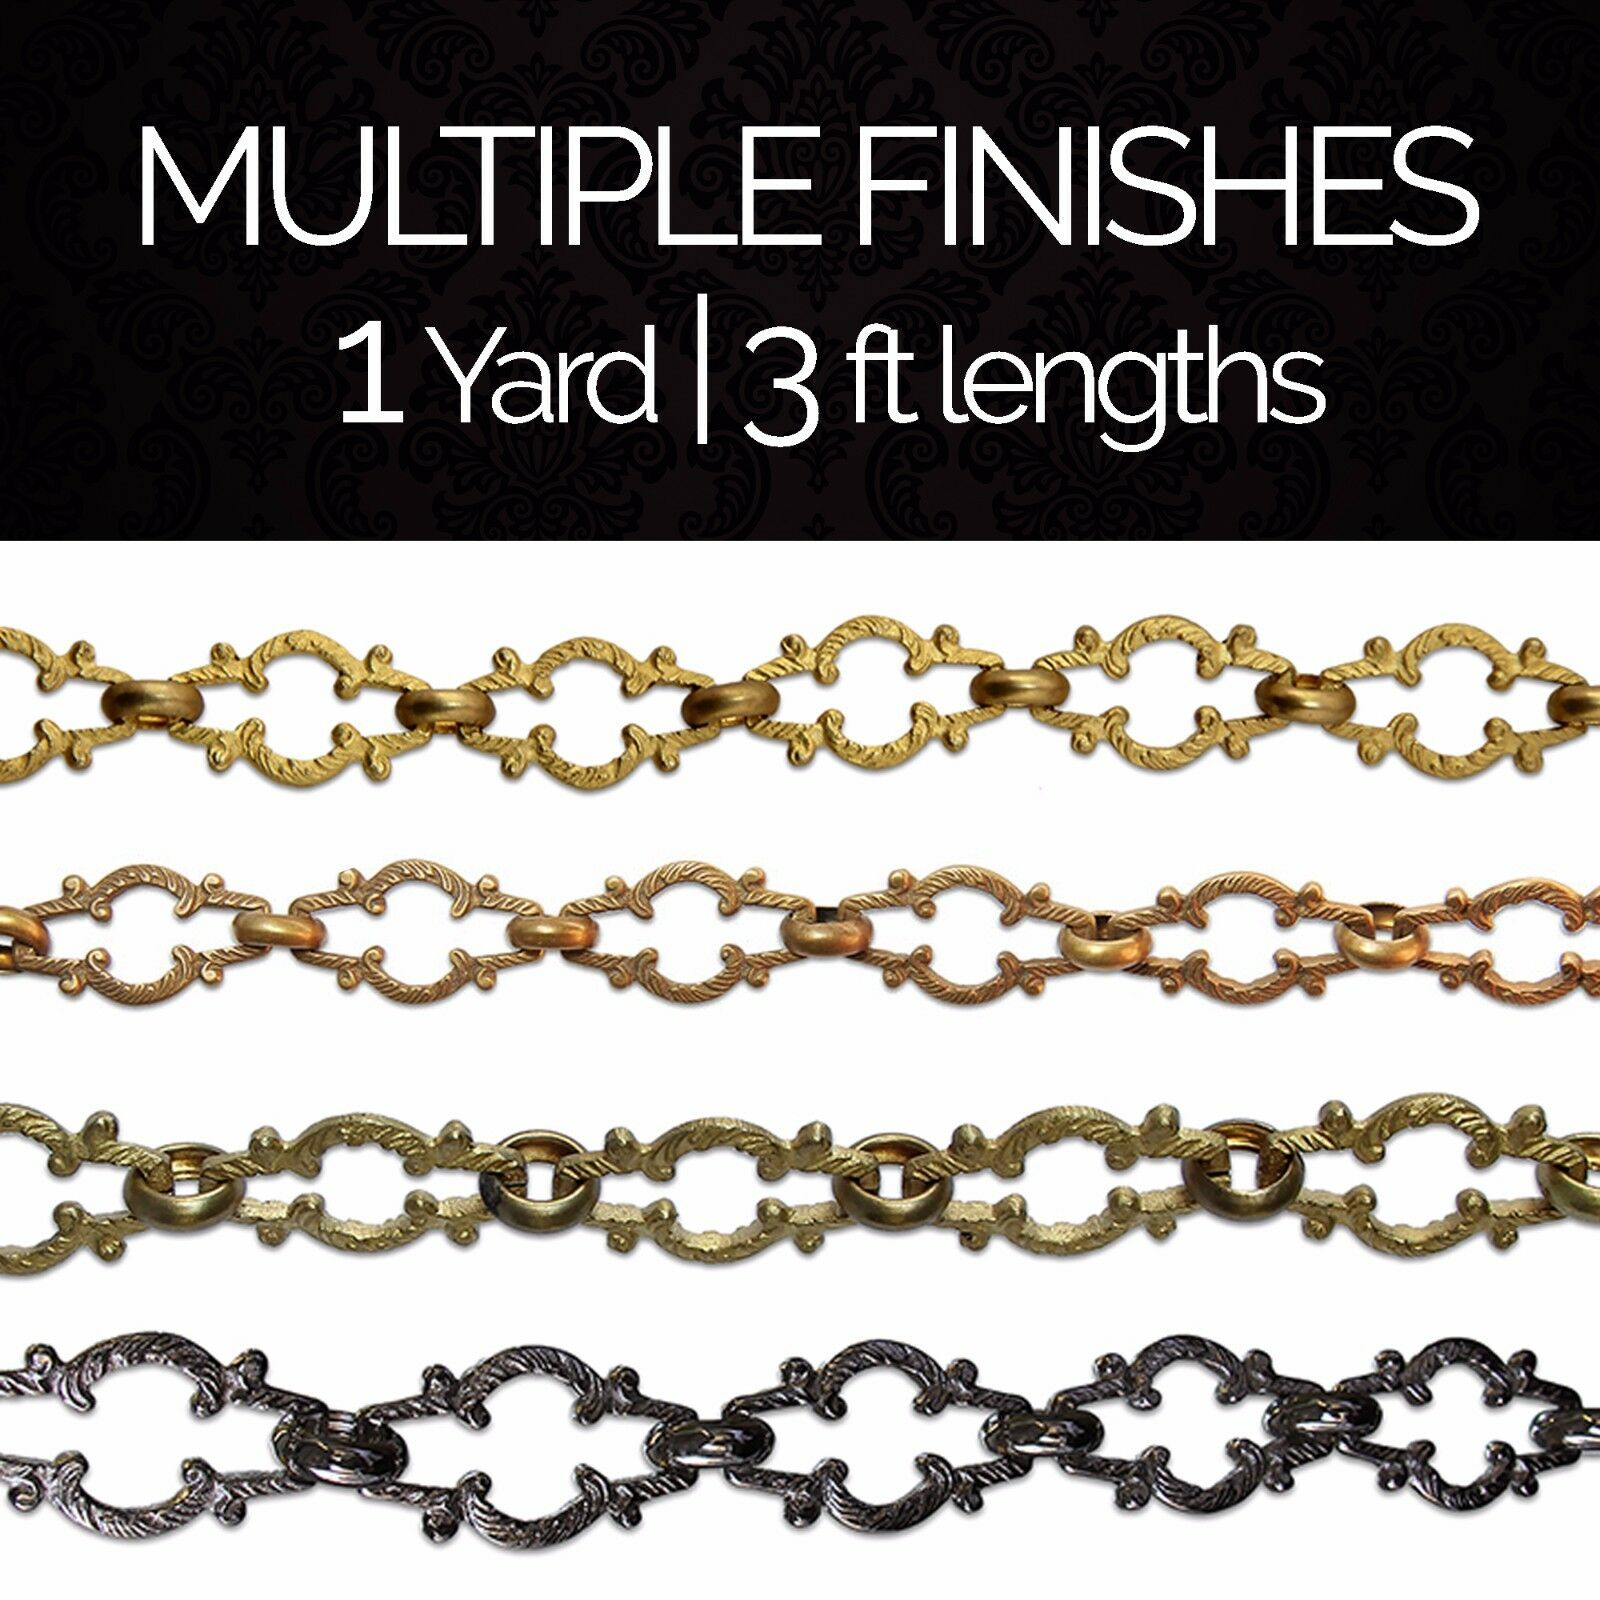 Solid Brass Motif Decorative Chandelier Lighting Chain #36 |